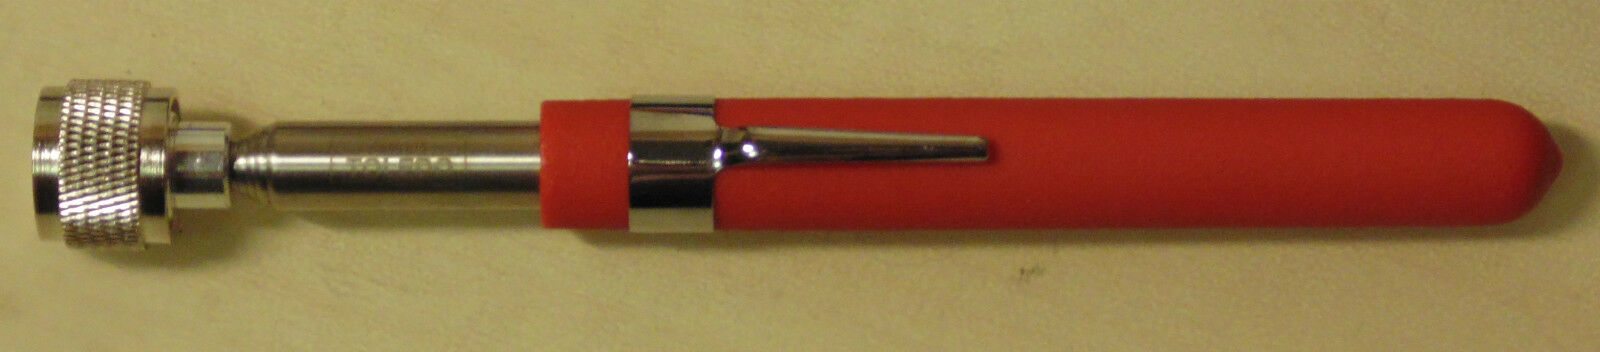 Toledo Pick Up Tool Magnetic Telescopic 3.6kg Toledo Trade Quality Tools